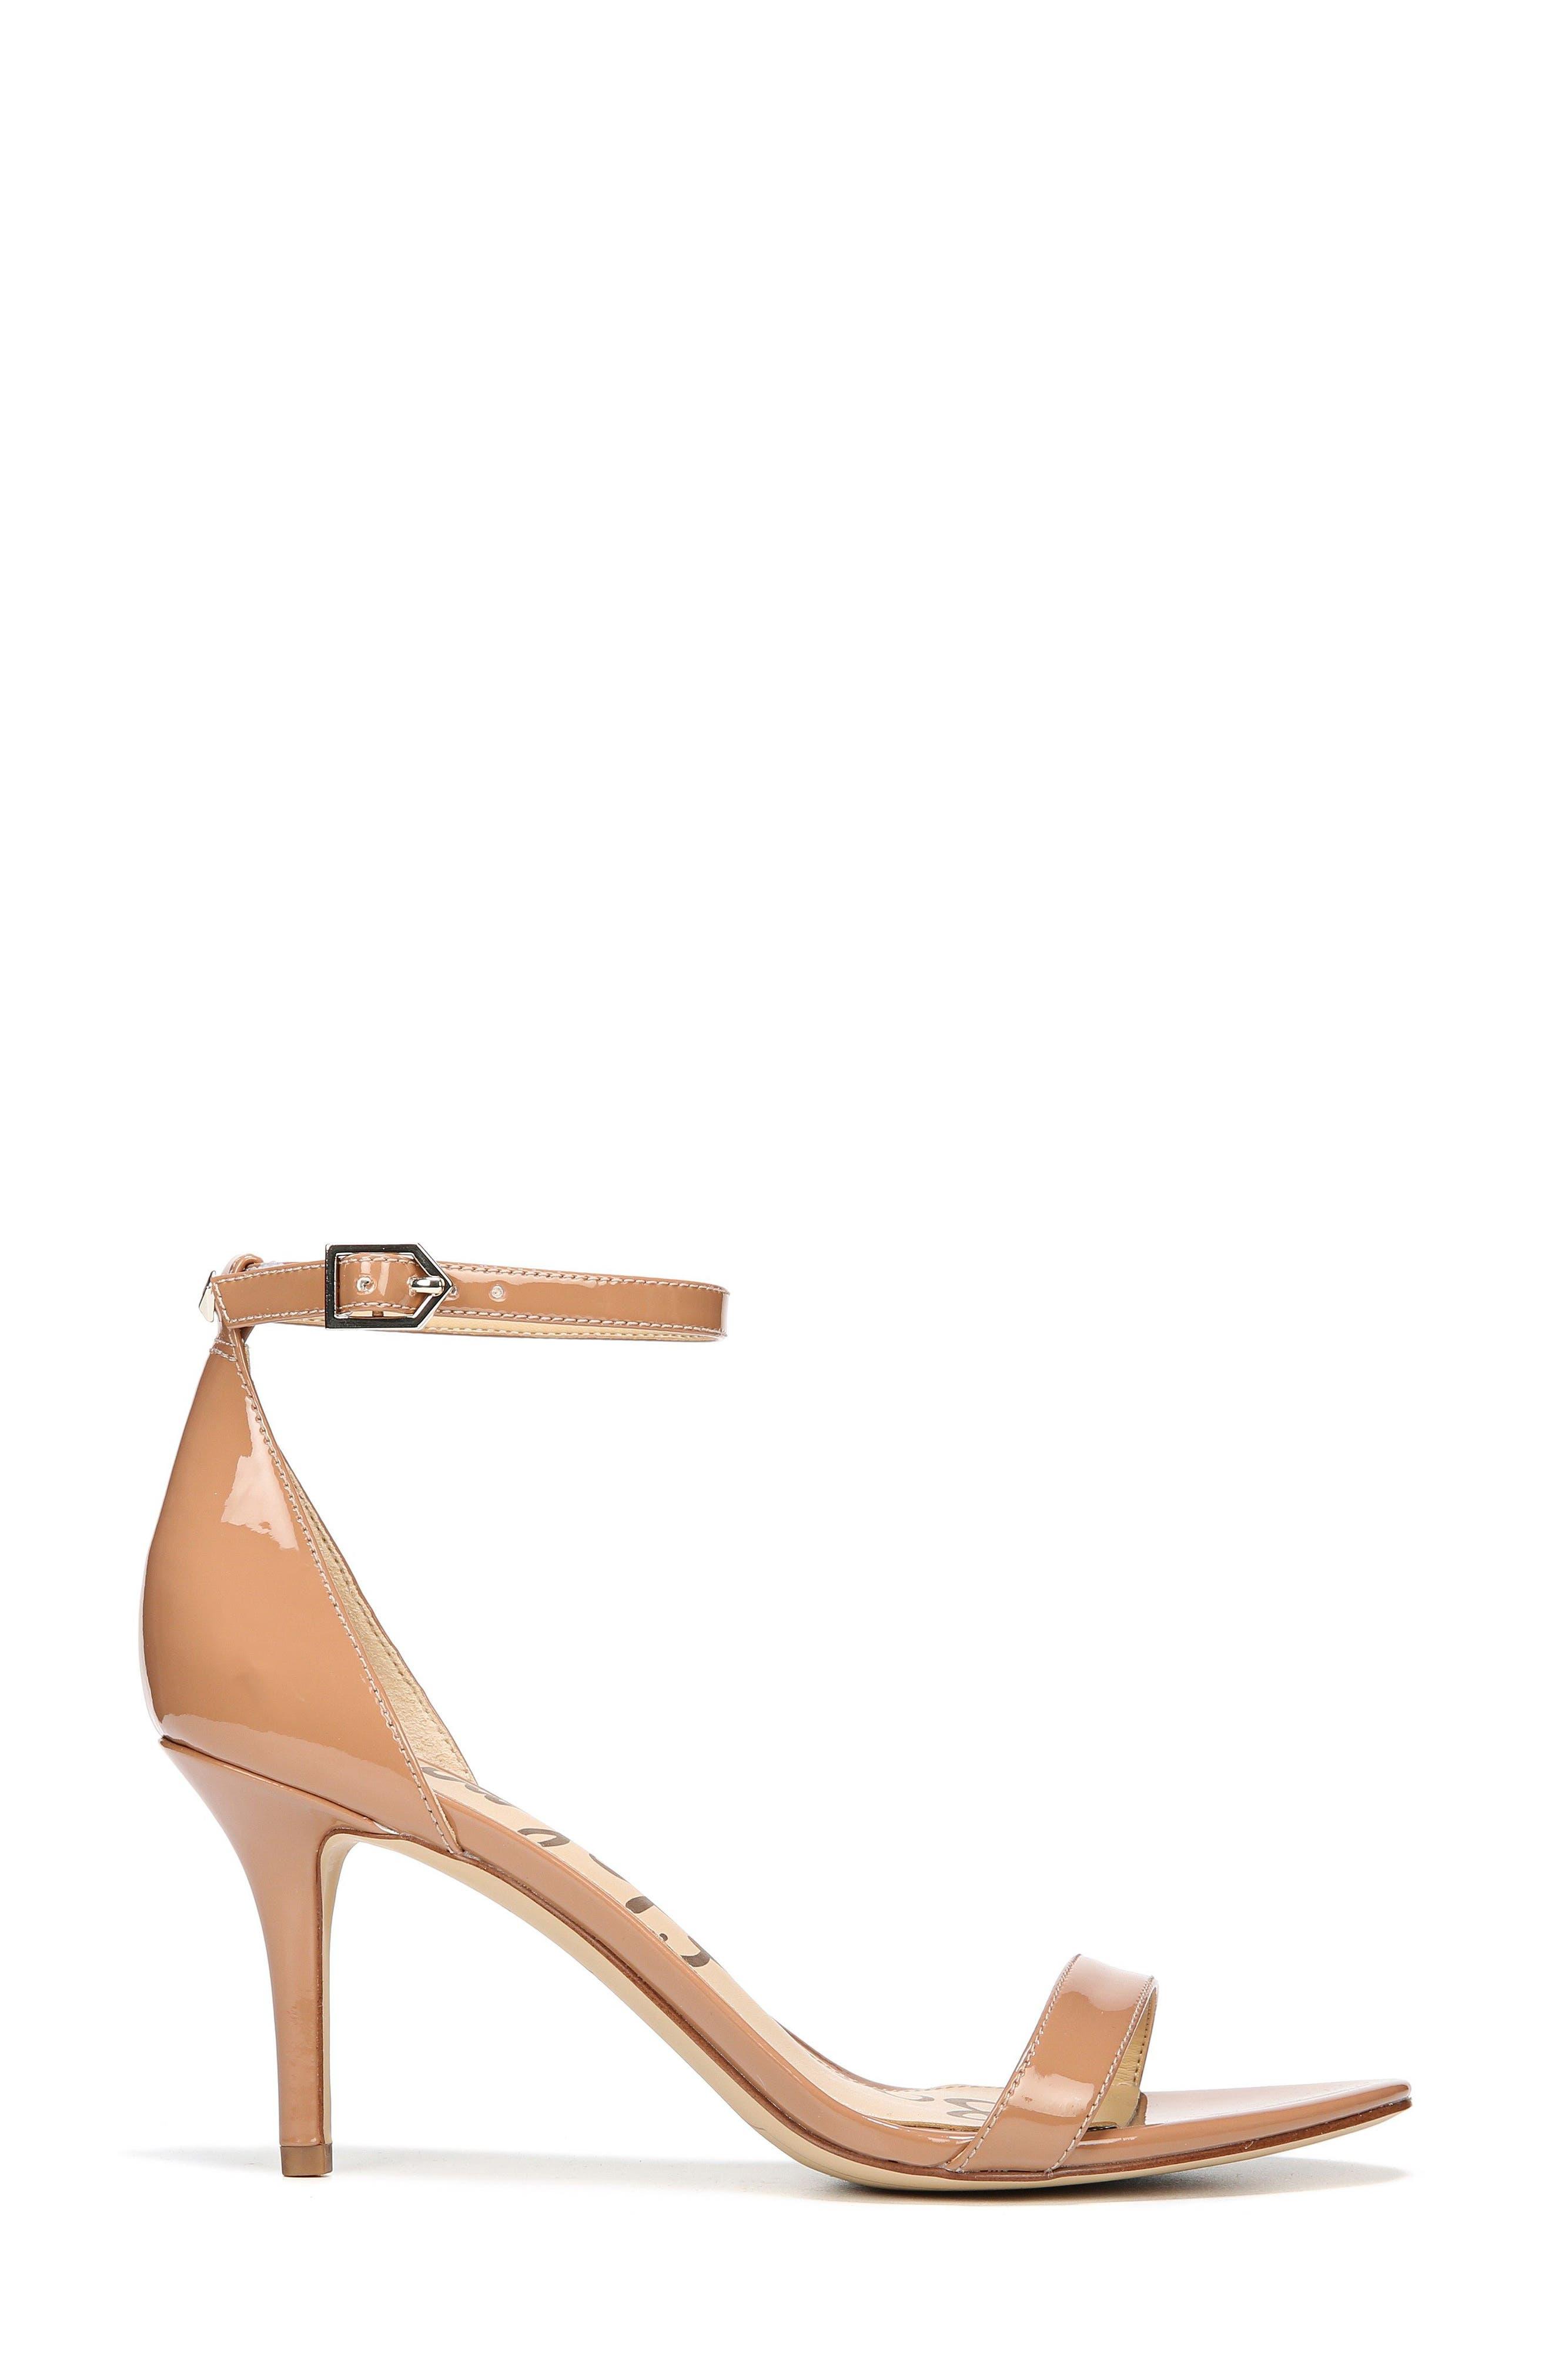 ,                             'Patti' Ankle Strap Sandal,                             Alternate thumbnail 190, color,                             257